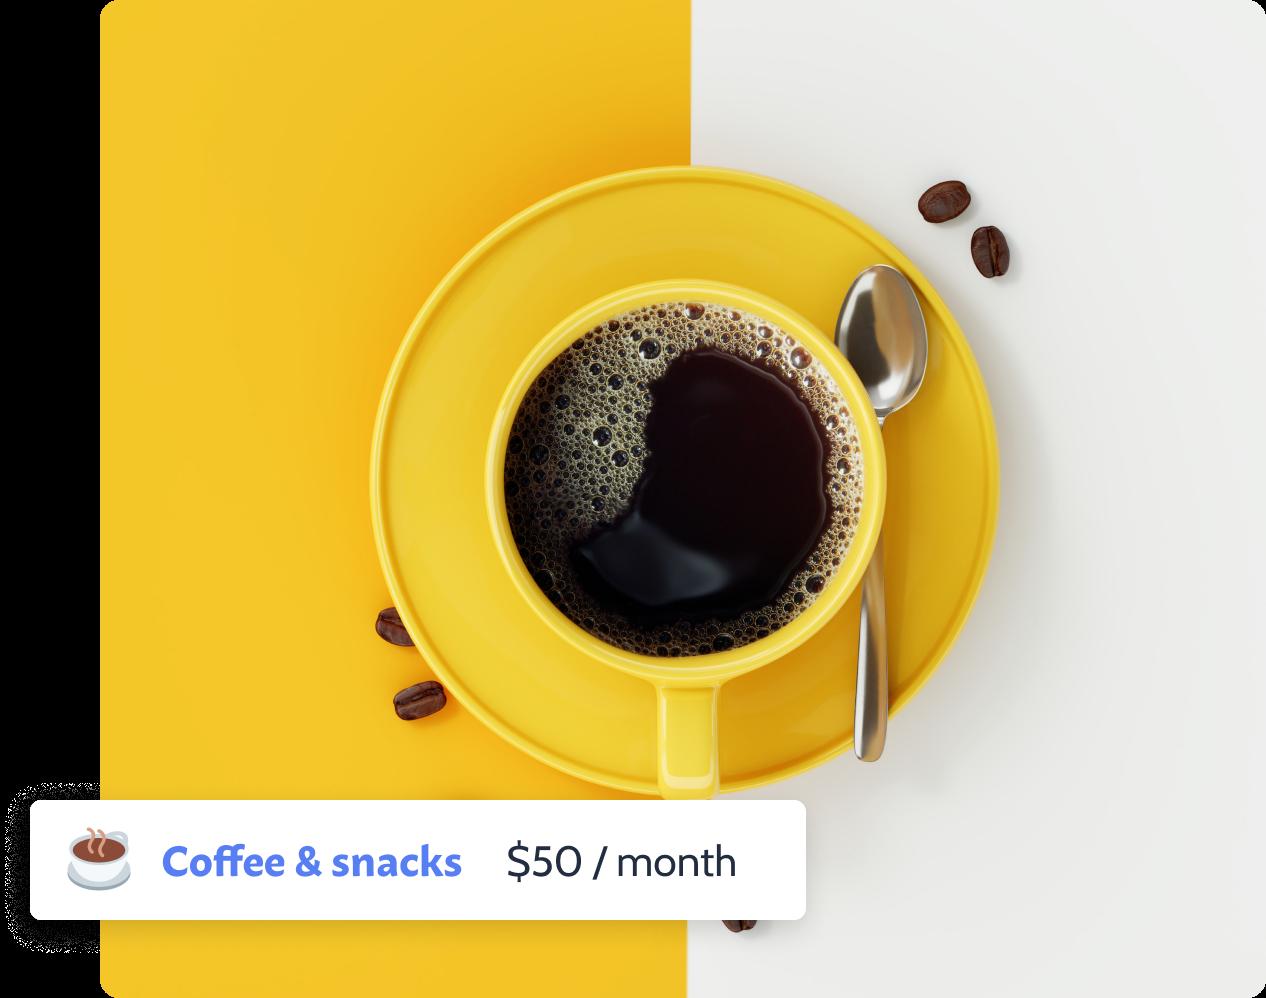 Booster program | Coffee & snacks